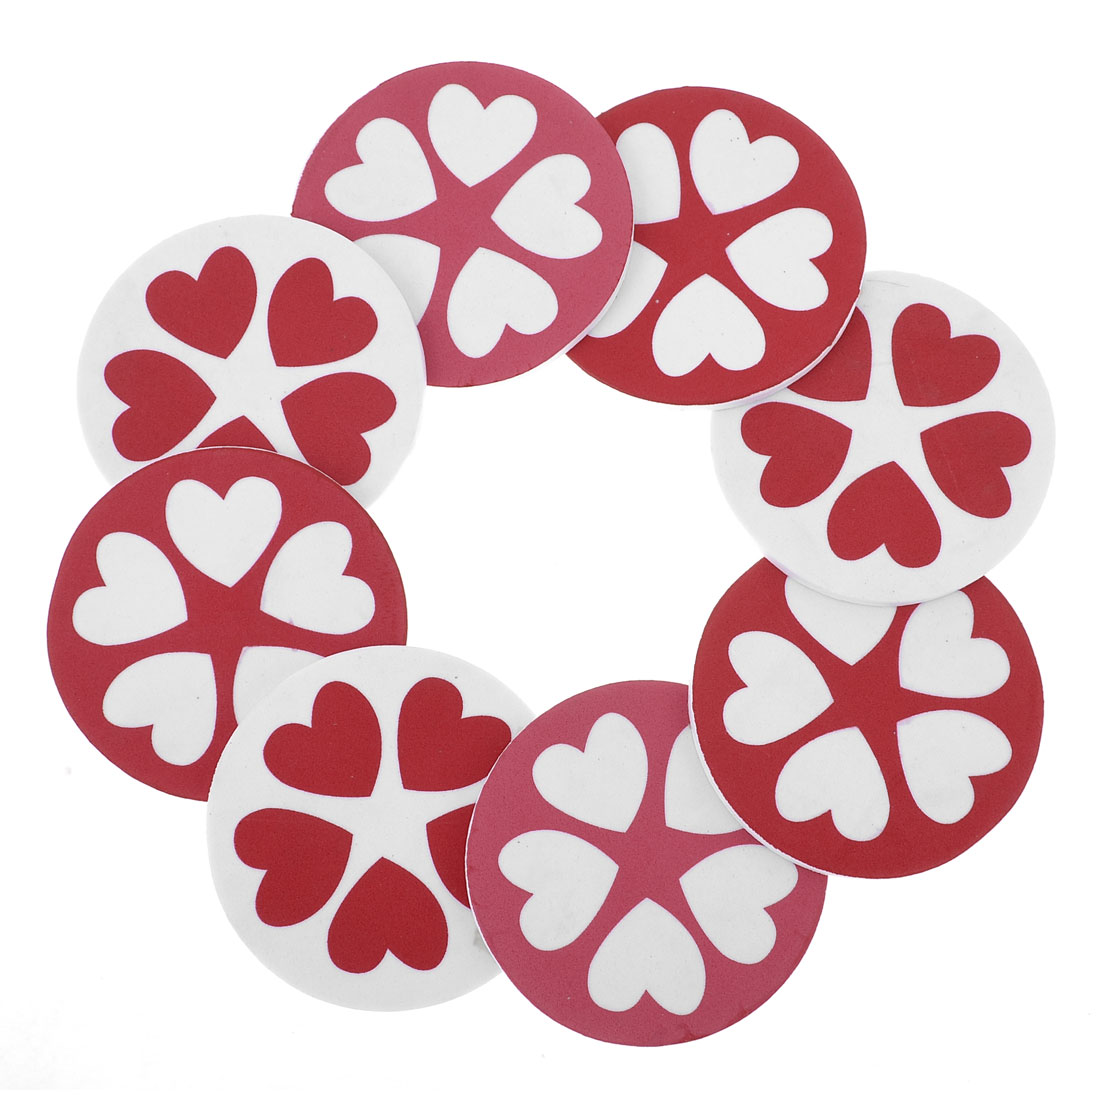 Room Decor Red White Heart Pattern 3D Garland Foam Wall Sticker